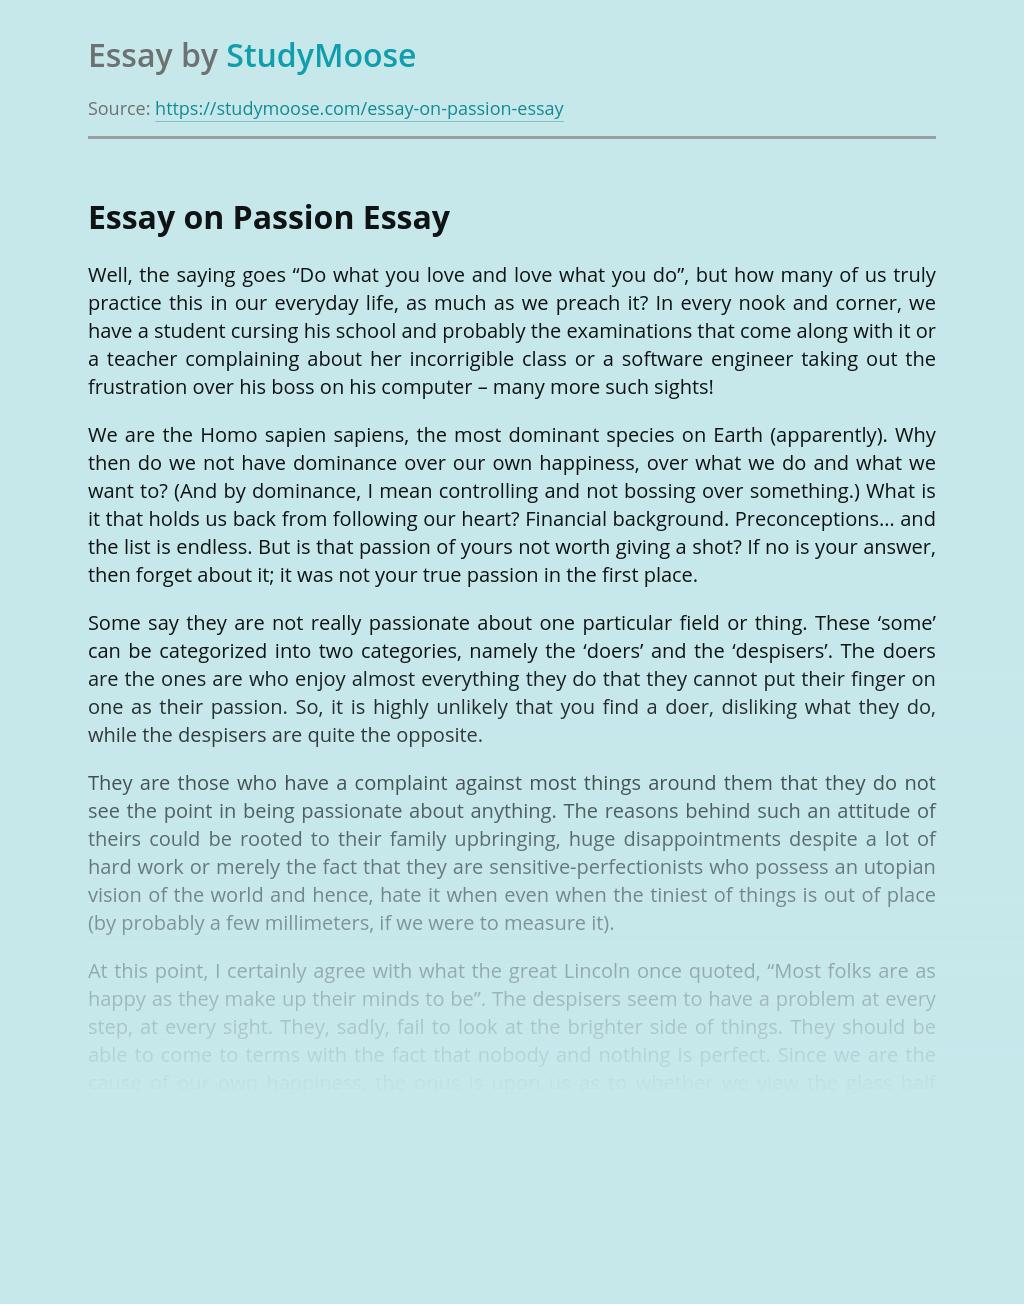 Essay on Passion